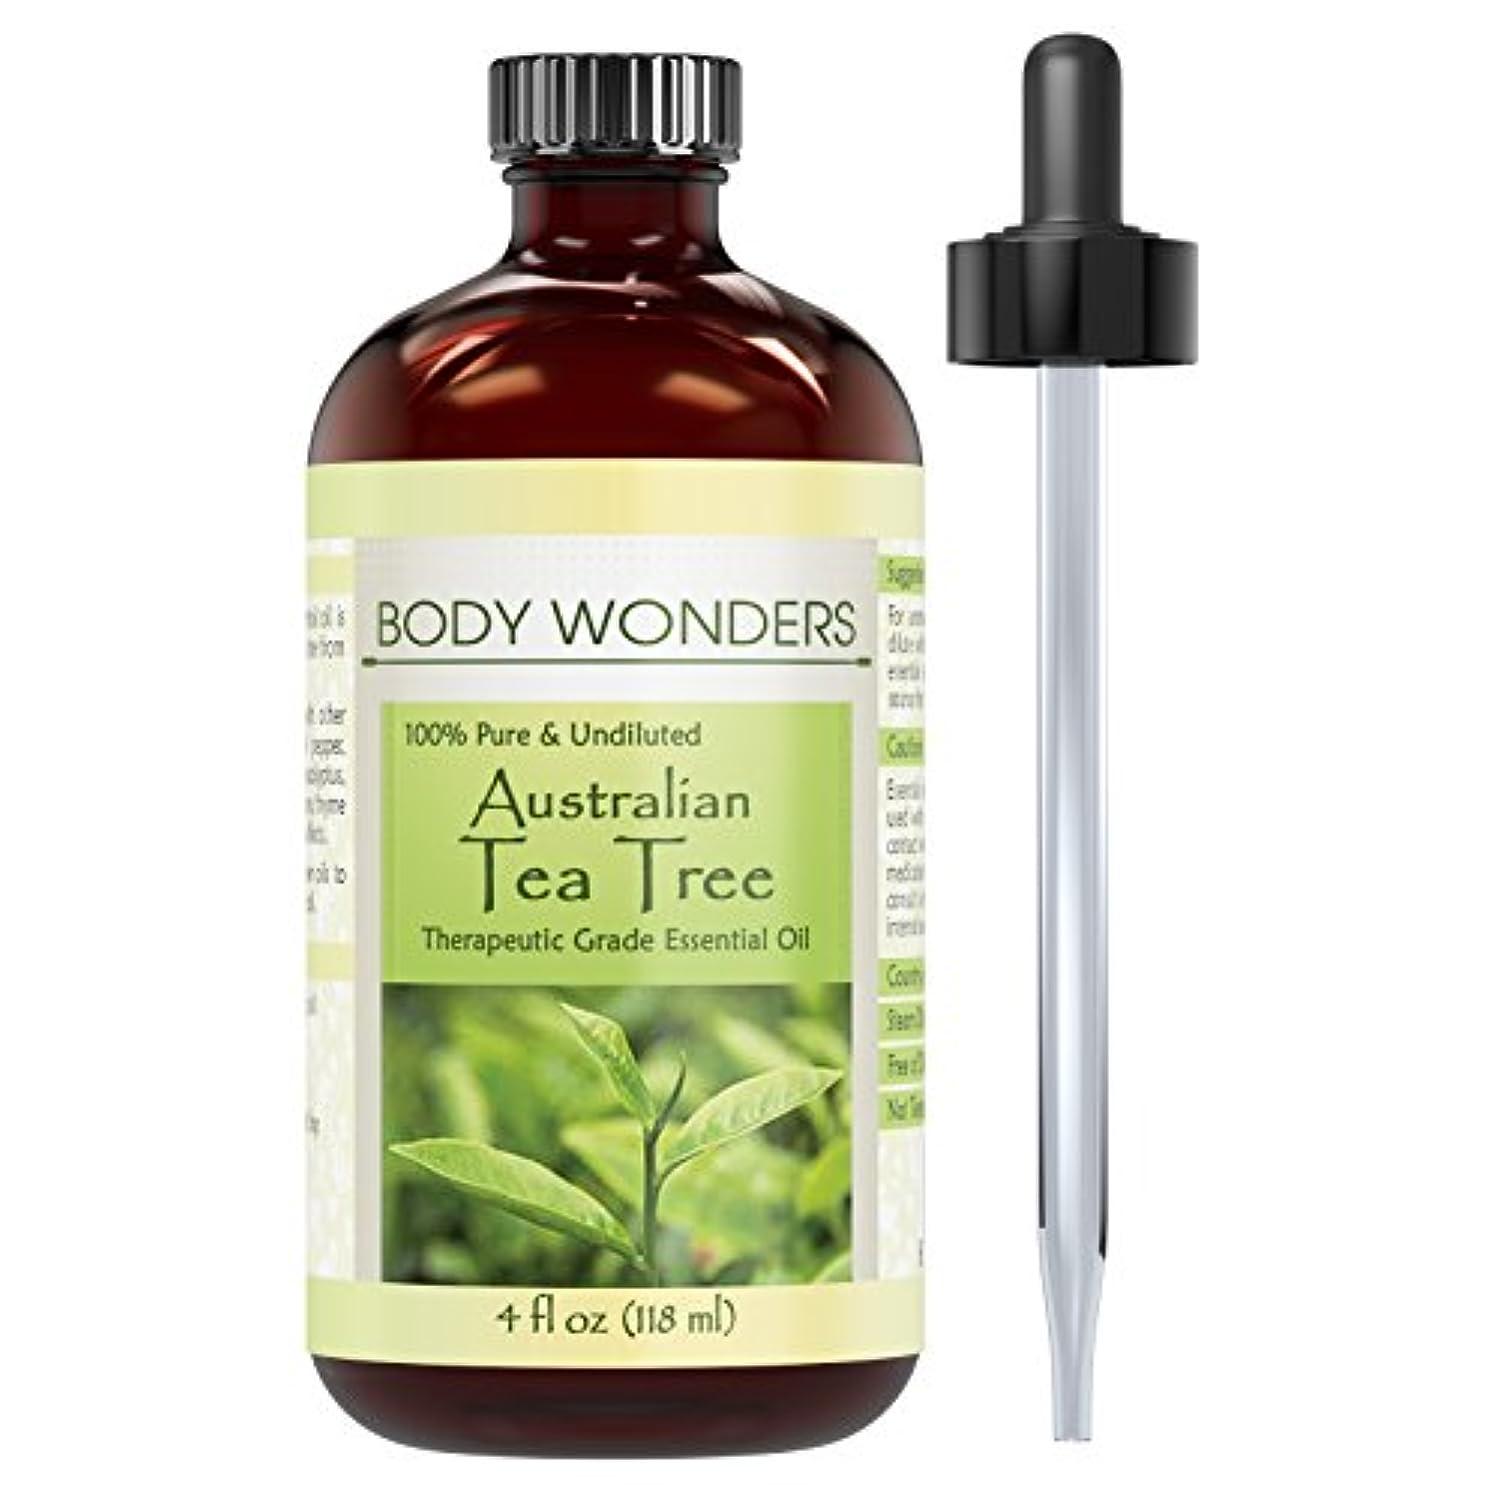 Body Wonders 100% Pure Australian Tea Tree Oil –4 fl oz Bottle- Finest of Essential Oils from Australia for Aromatherapy